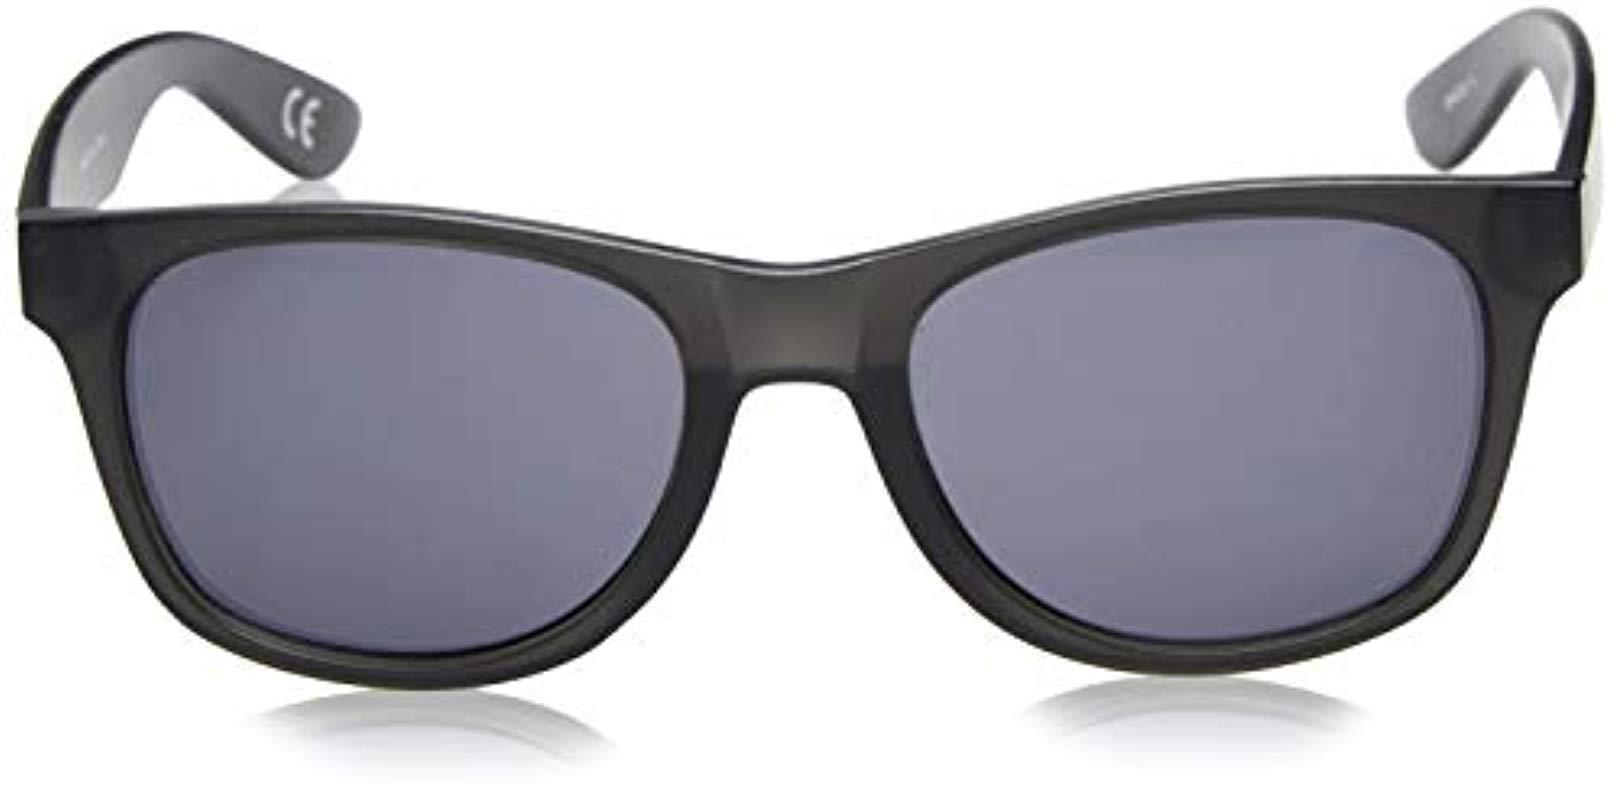 fbf3fcbbf69 Vans - Black Sunglasses for Men - Lyst. View fullscreen